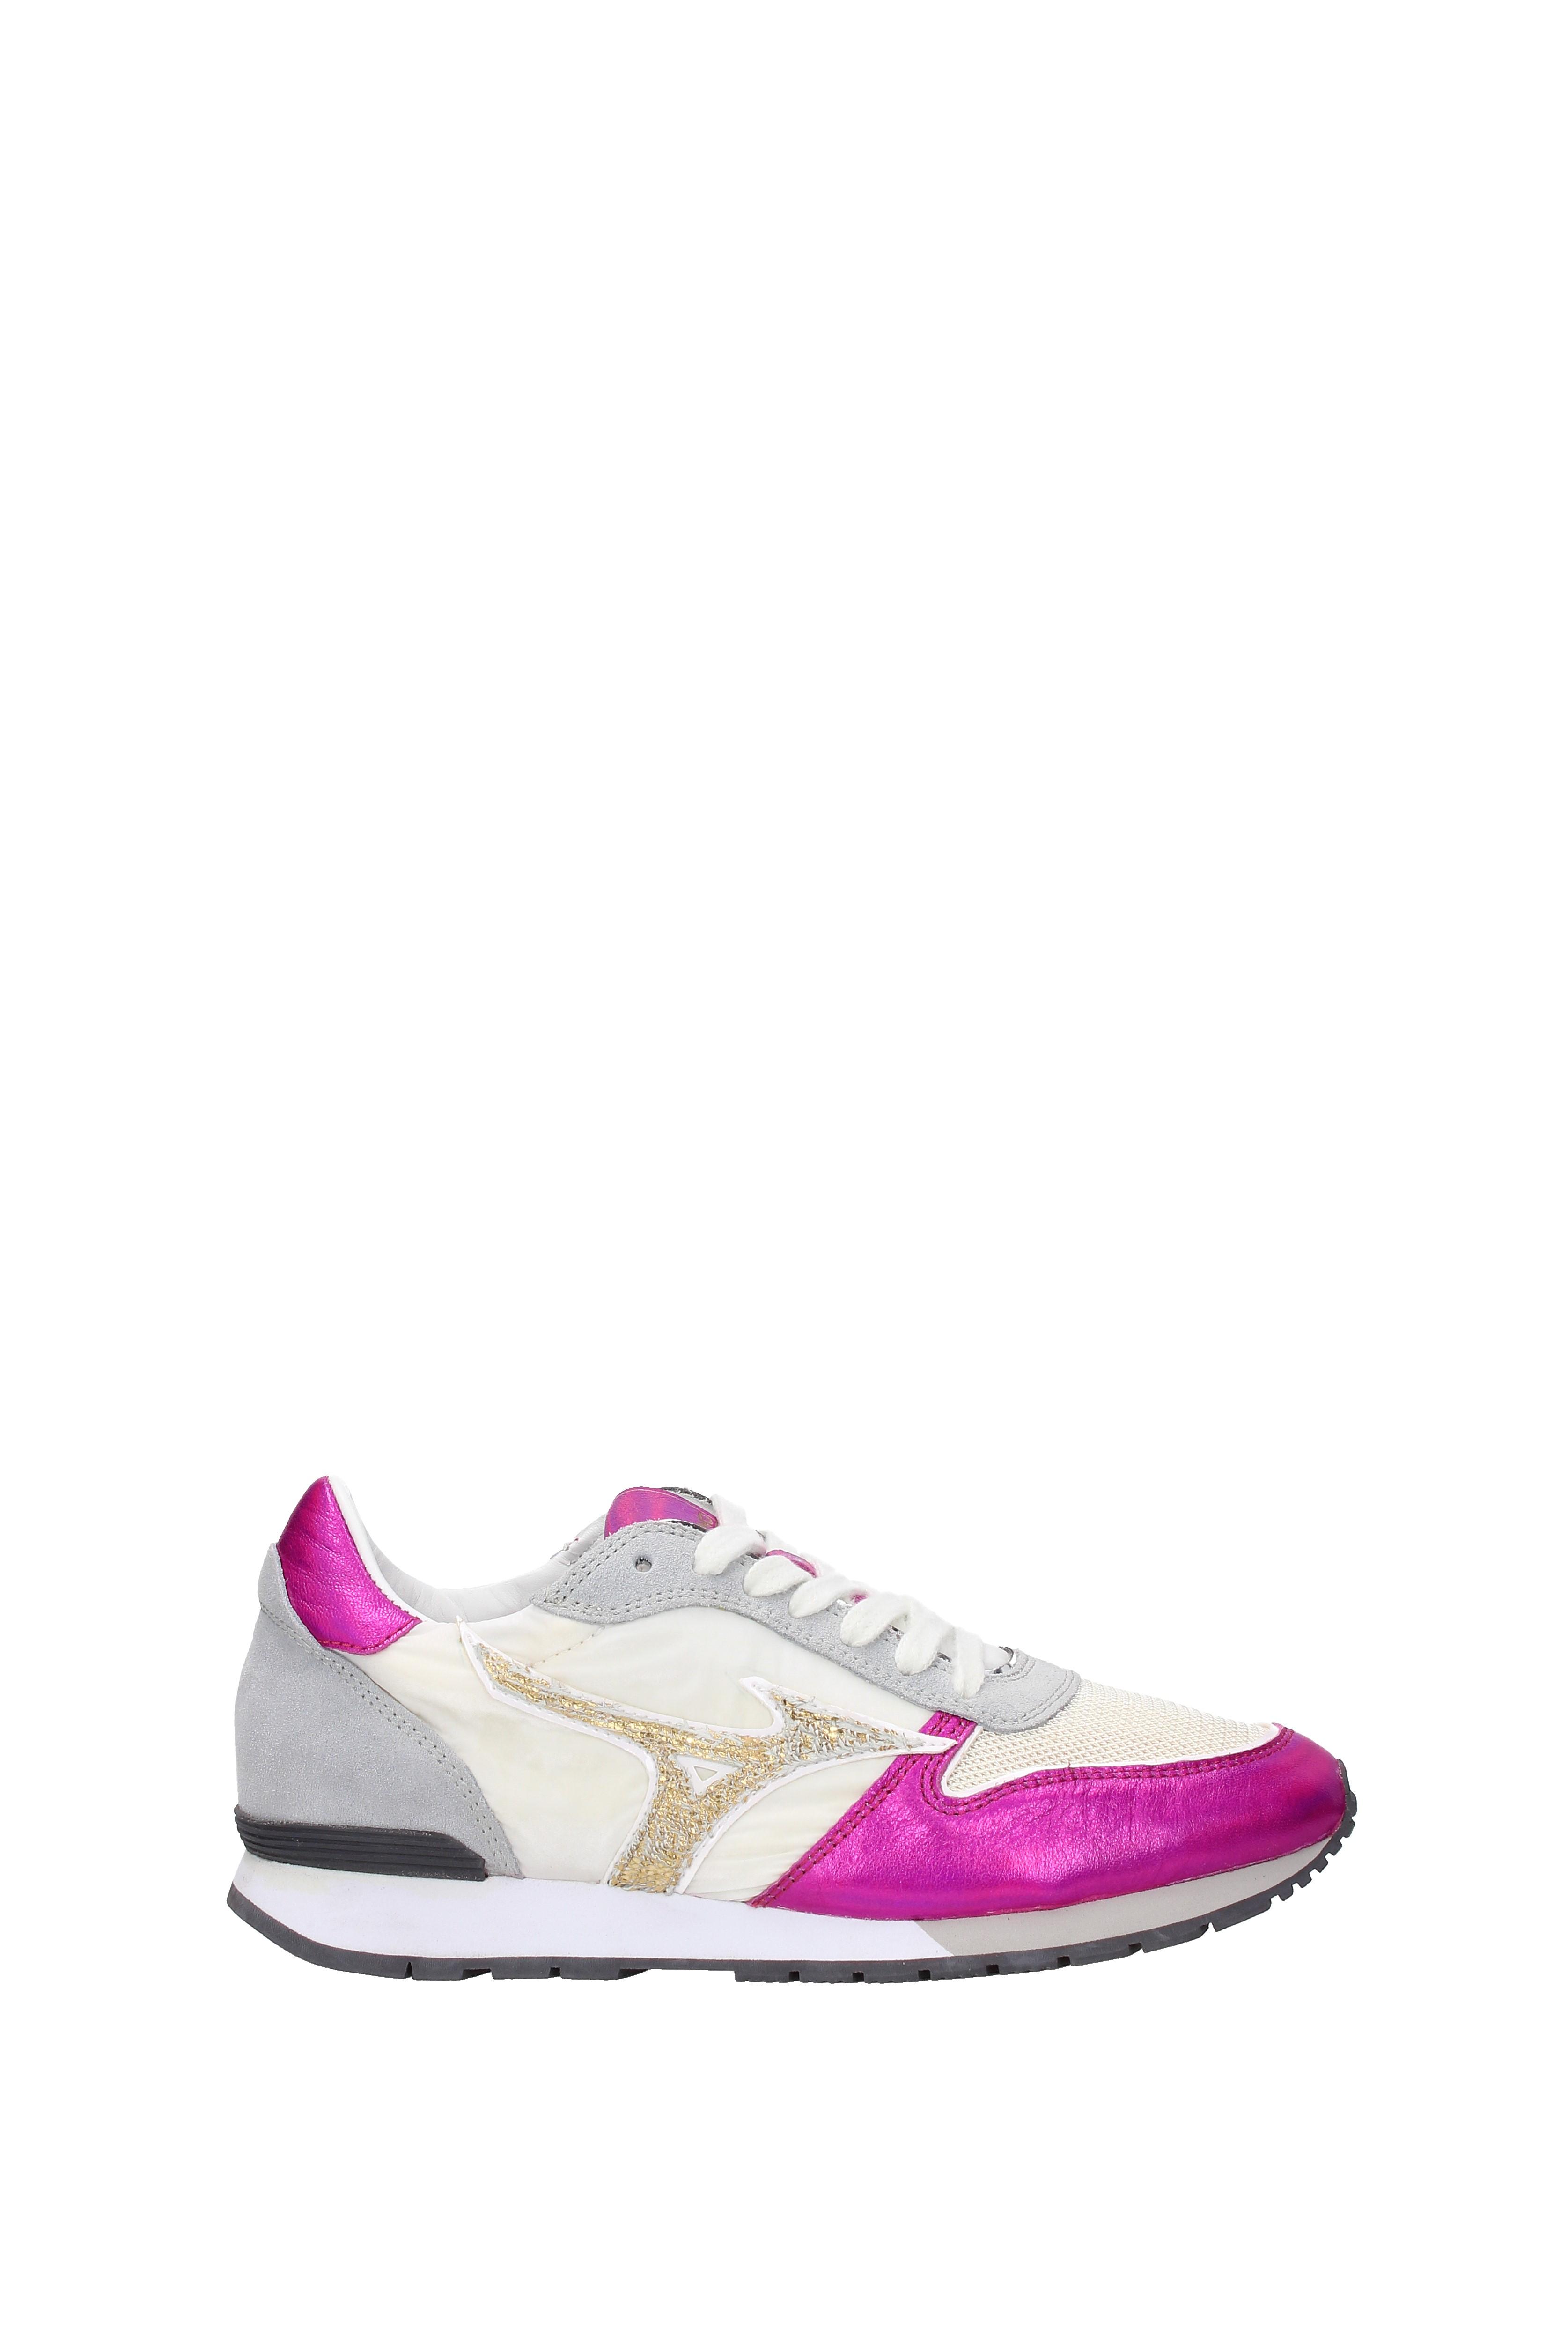 Sneakers-Mizuno-etamin-Women-Fabric-FLUOD1GC1745